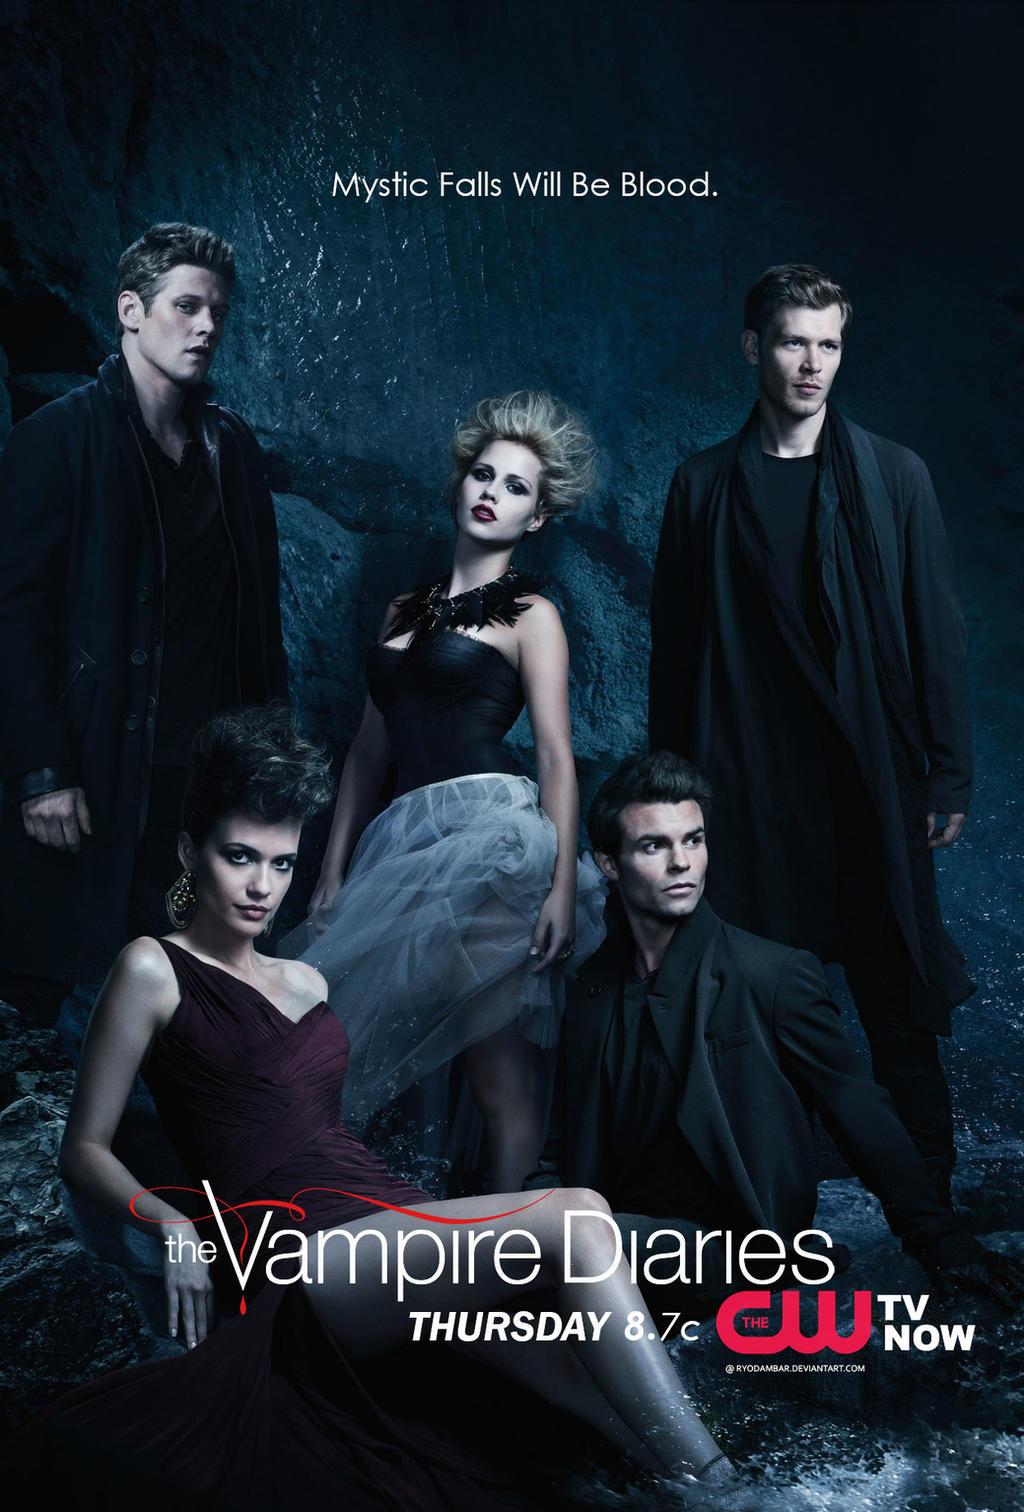 Vampire Diaries Netflix Poster TVD:IV Promo Poster-My...